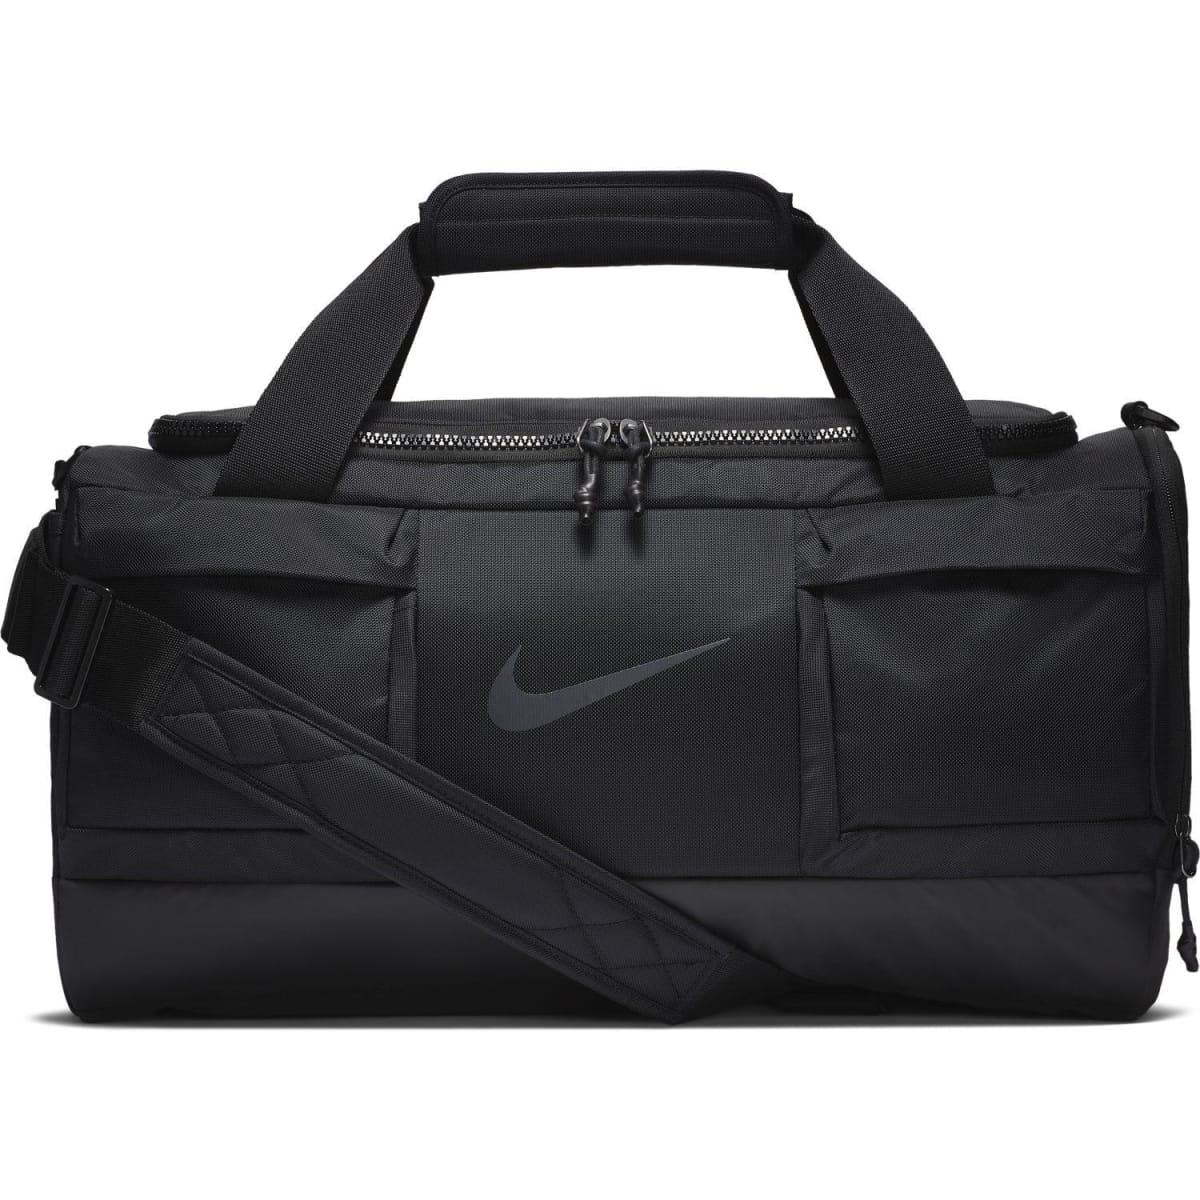 4848c323 Product Image. Nike Vapor Power Small Duffel Bag